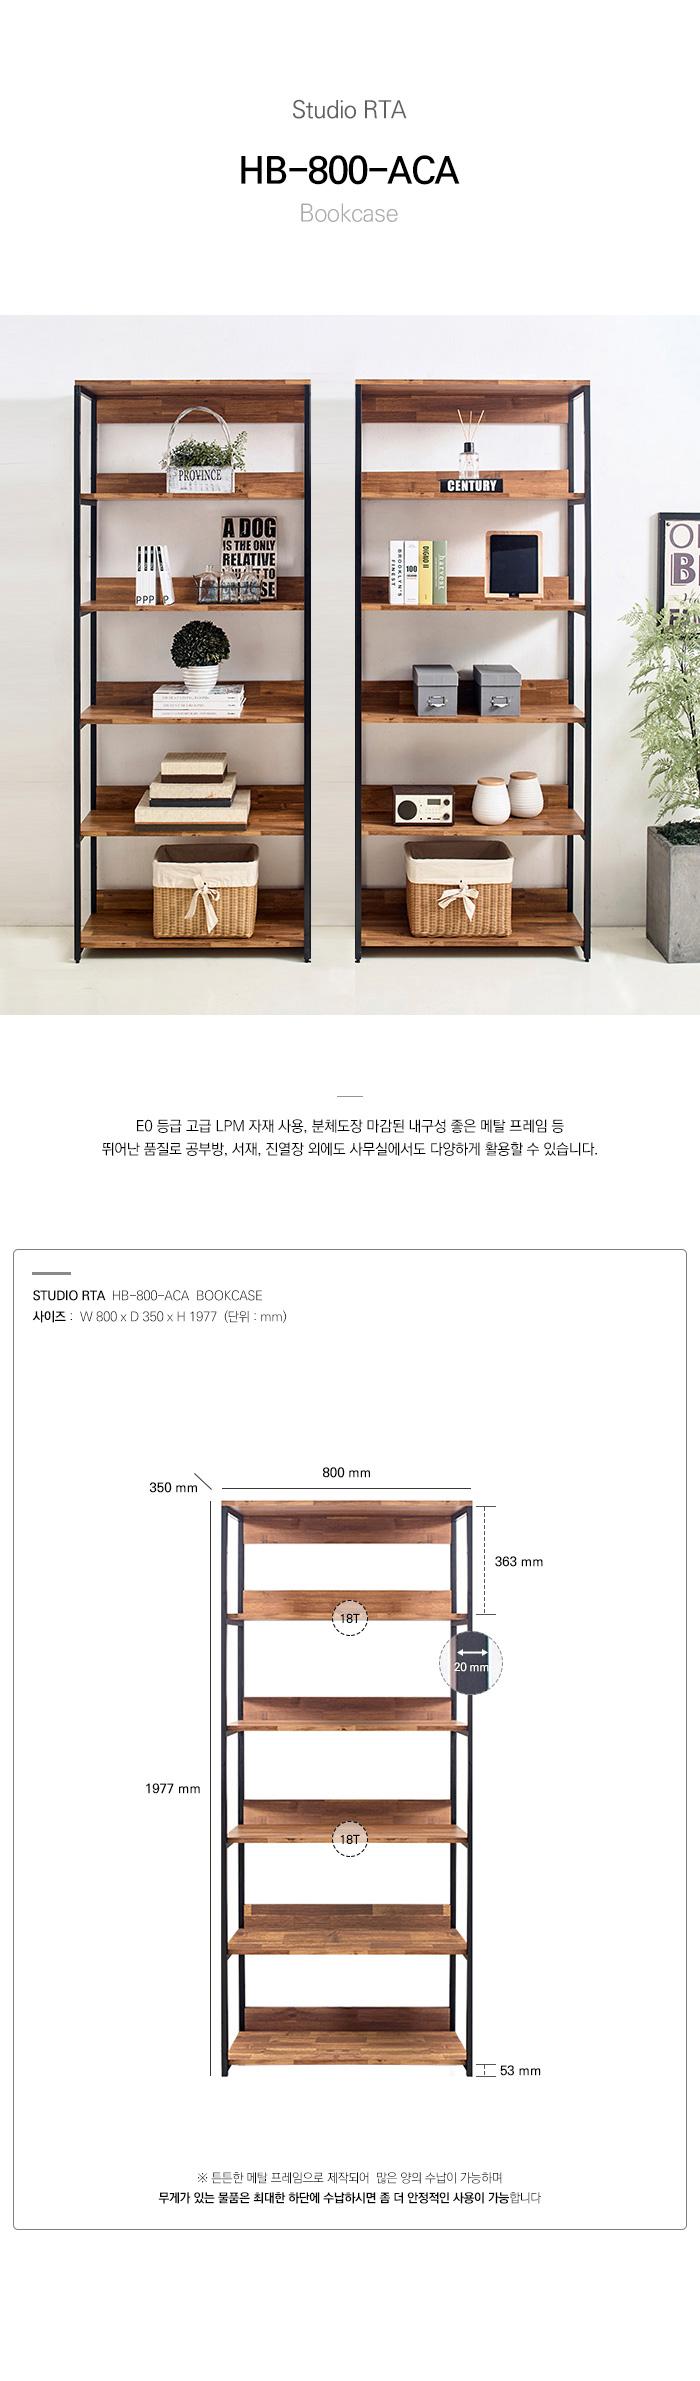 HB-800-aca_bookcase_200909-1.jpg